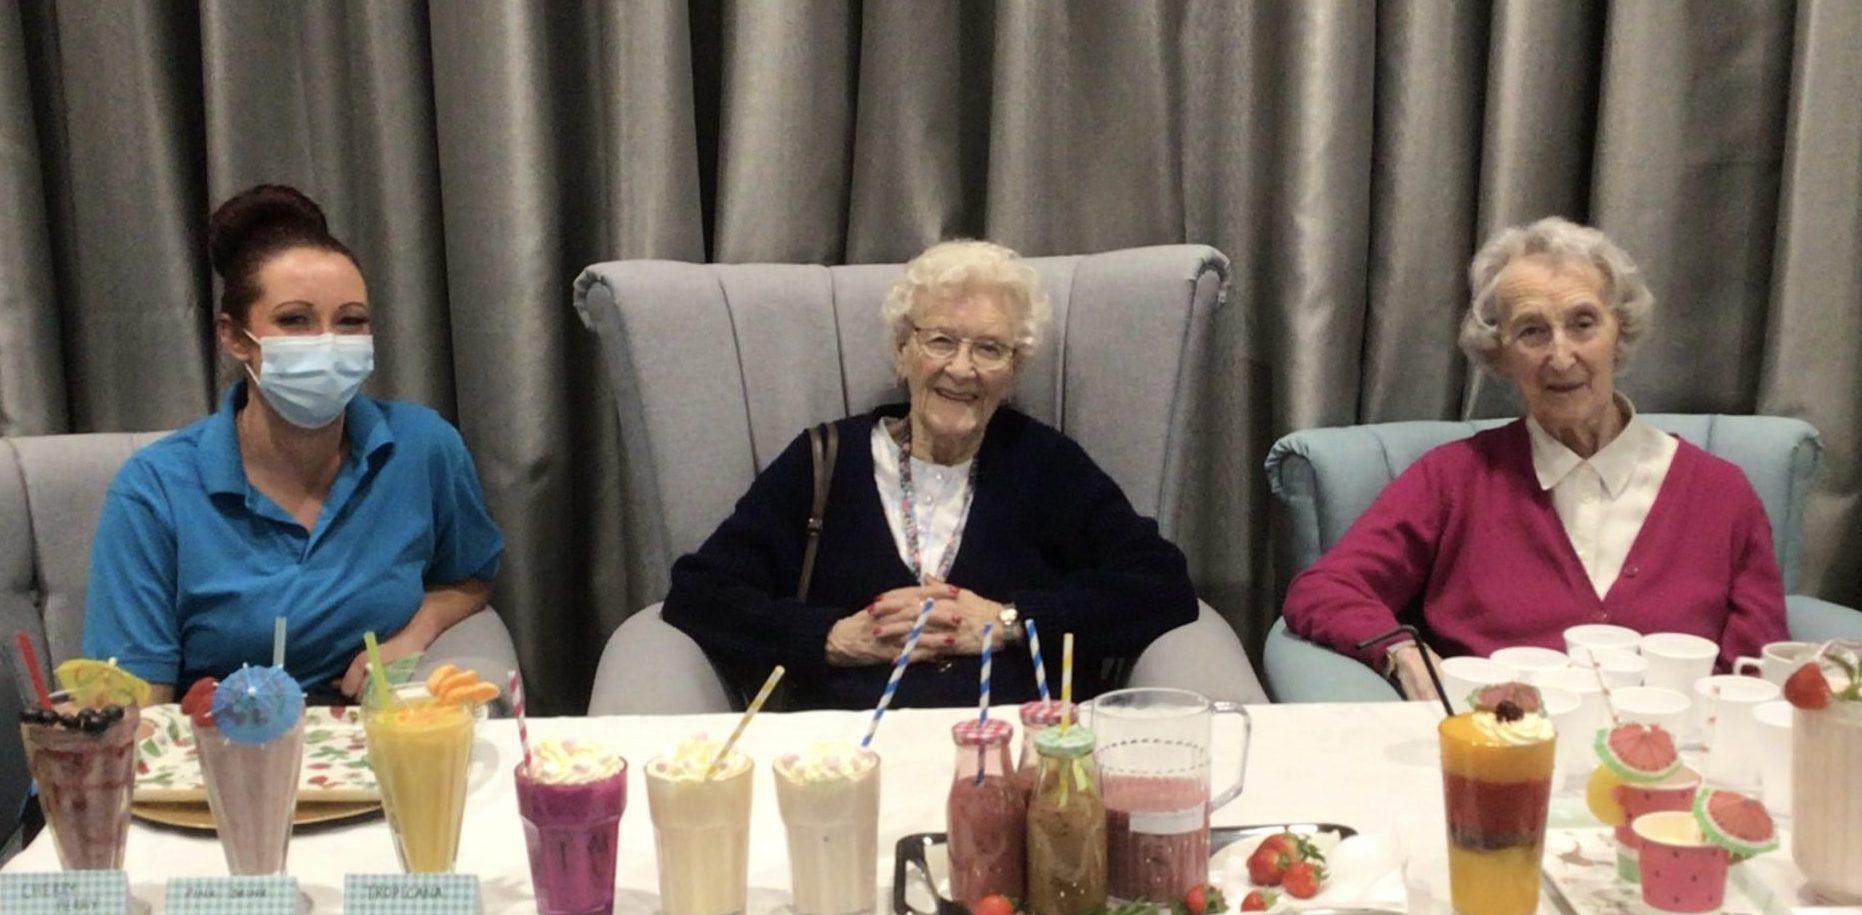 Connaught Court - Doris, Isobel and Kim